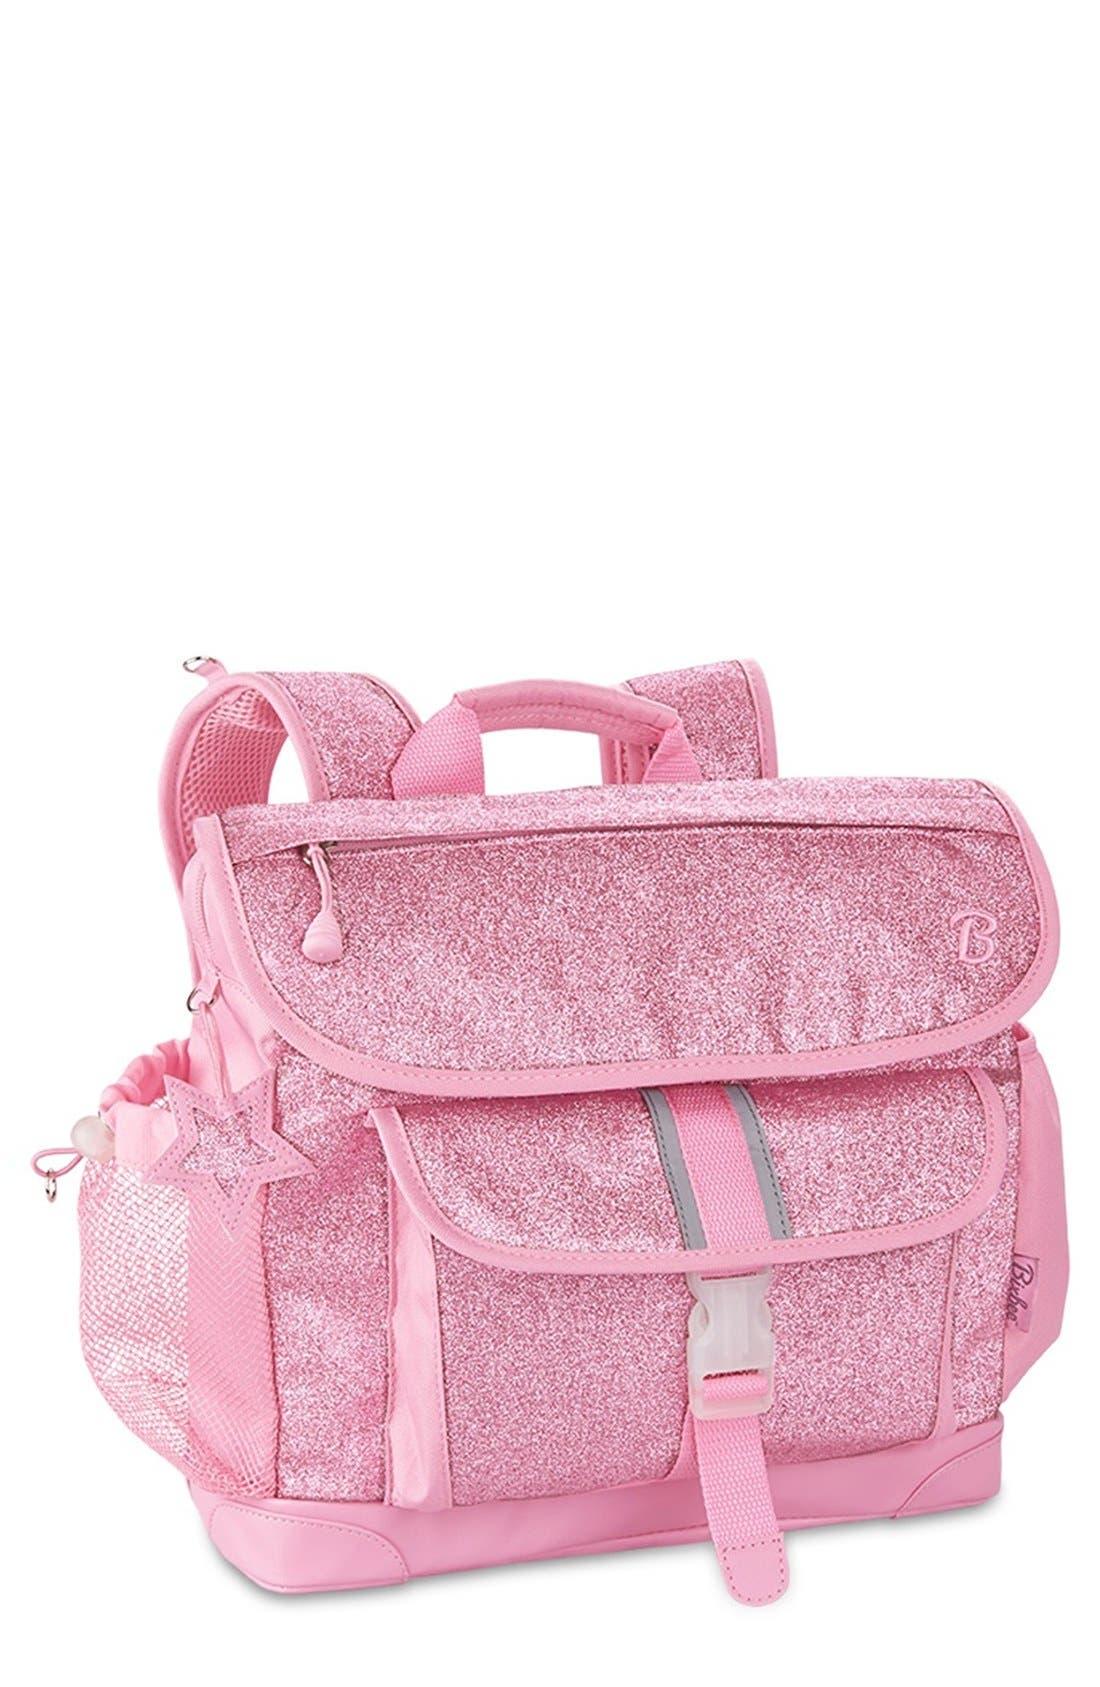 Alternate Image 1 Selected - Bixbee 'Medium Sparkalicious' Backpack (Kids)